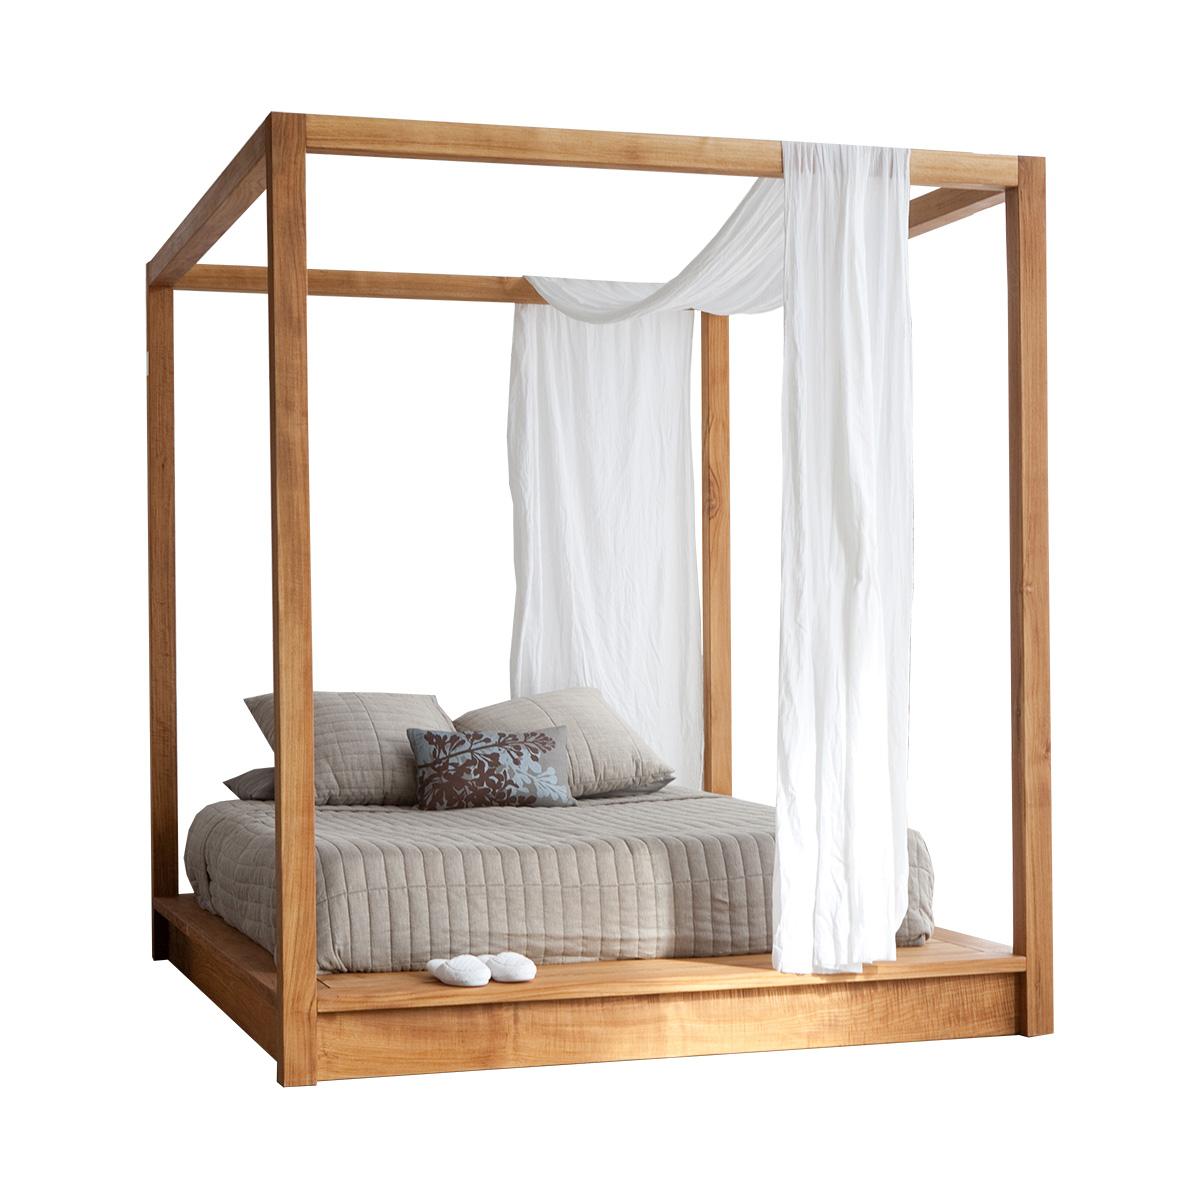 PCH Series Canopy Platform Bed PCH Series Canopy Platform Bed  sc 1 st  Platform Beds Online & Canopy Beds - Modern Eco-Friendly Wood Frames - Platform Beds Online